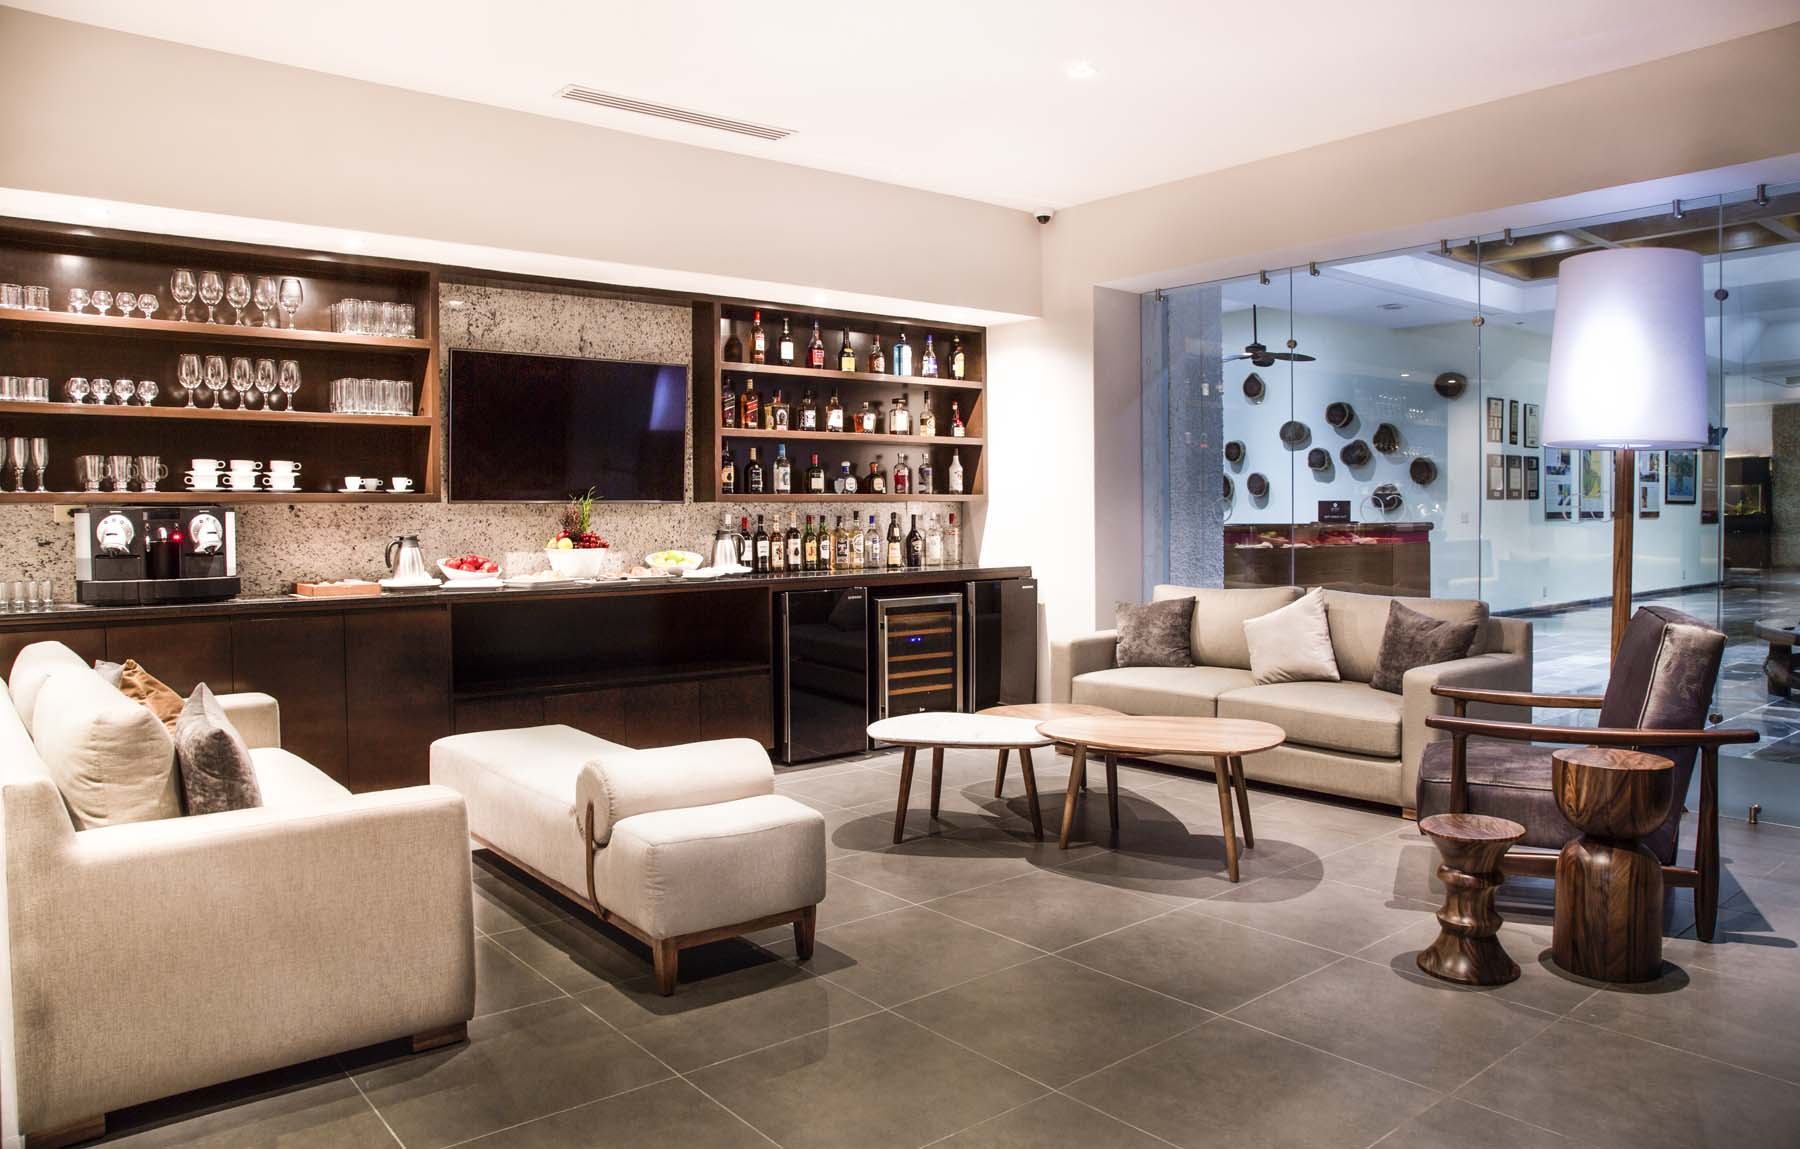 El Cid Hotels and Resorts, modernismo puro